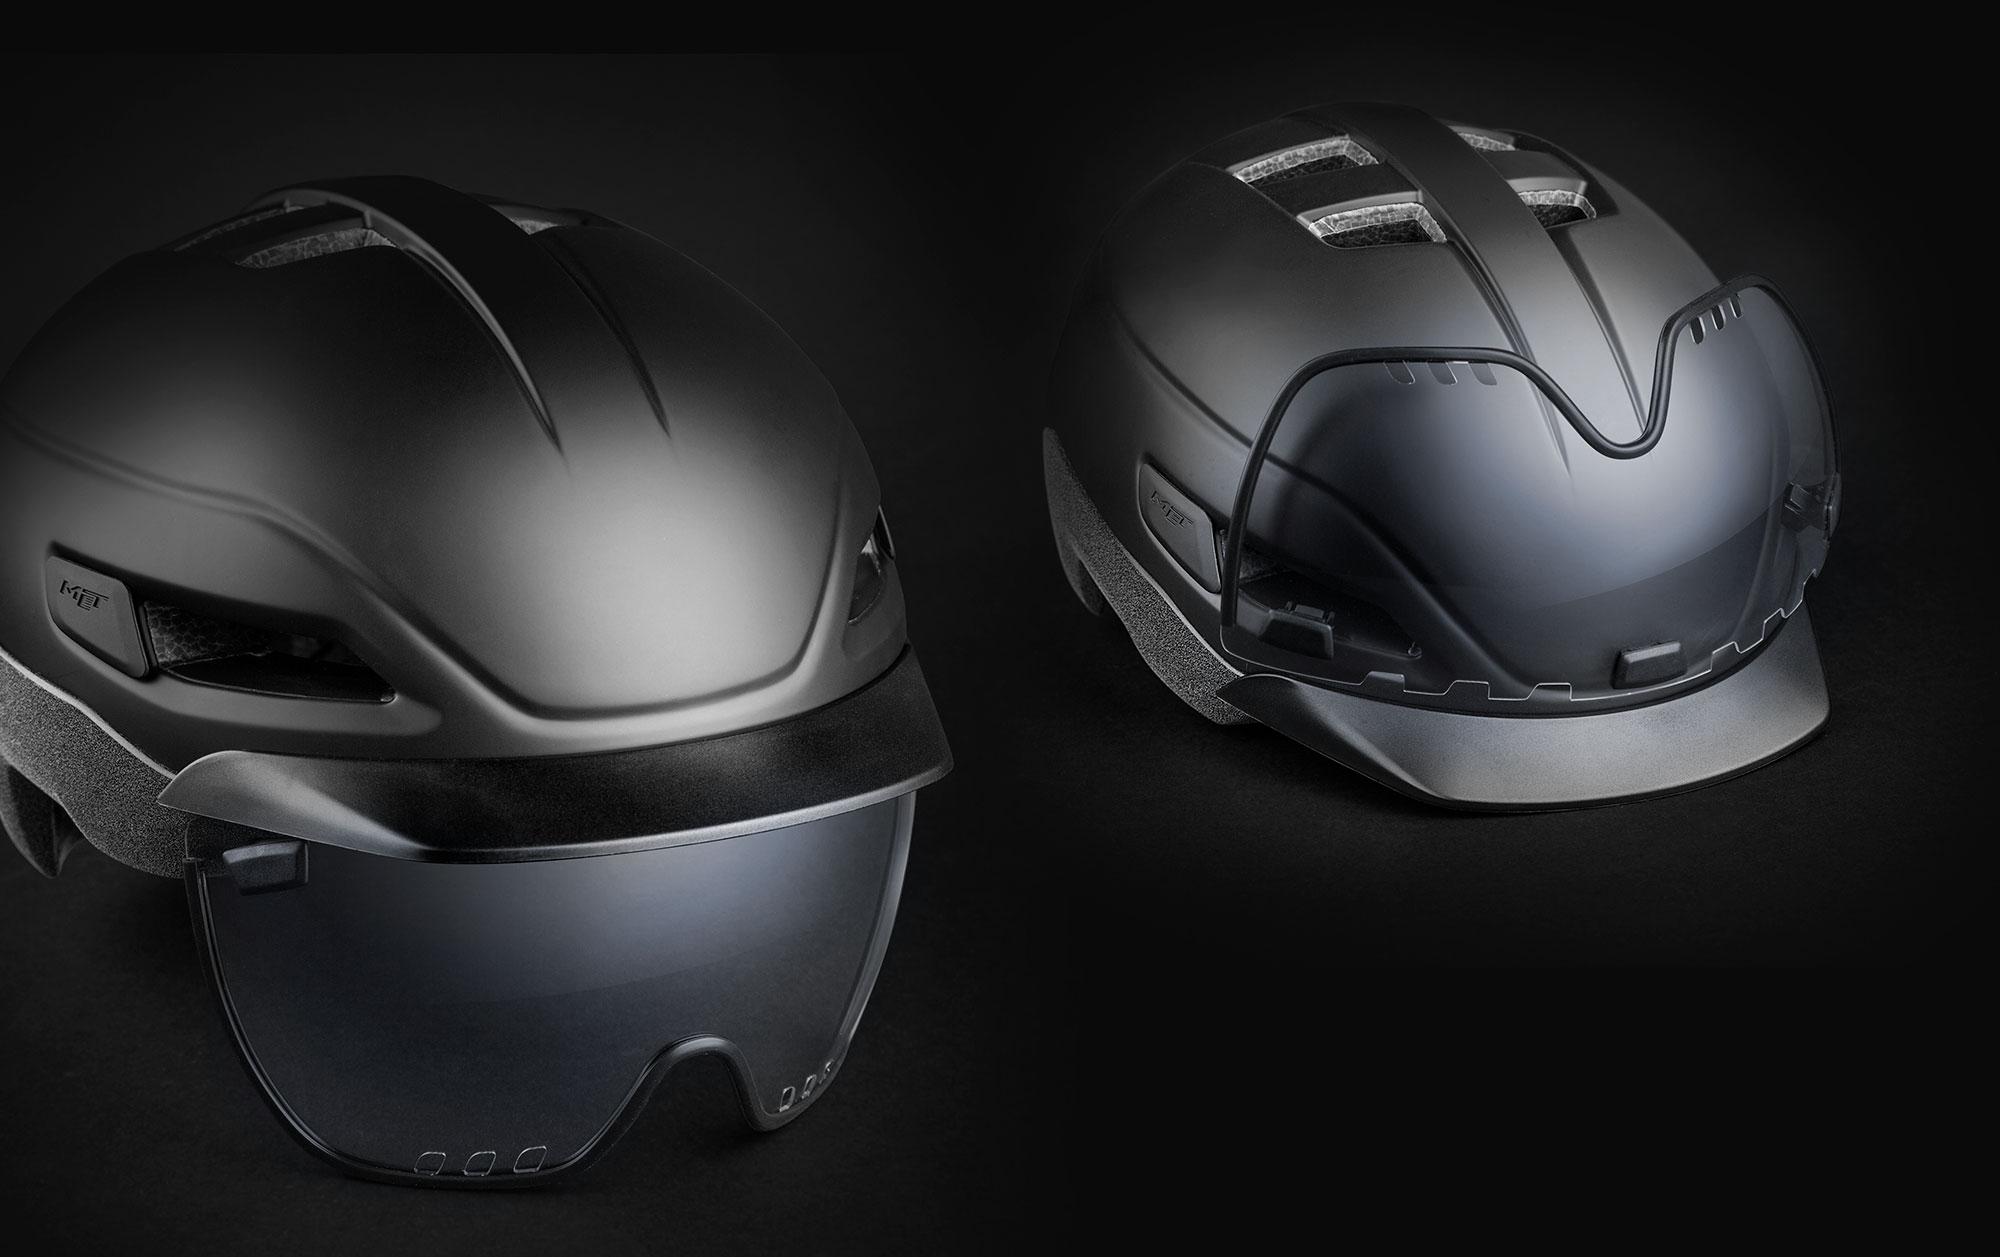 MET Grancorso Urban, E-bike and Commuting Helmet Magnetic Dual Shield